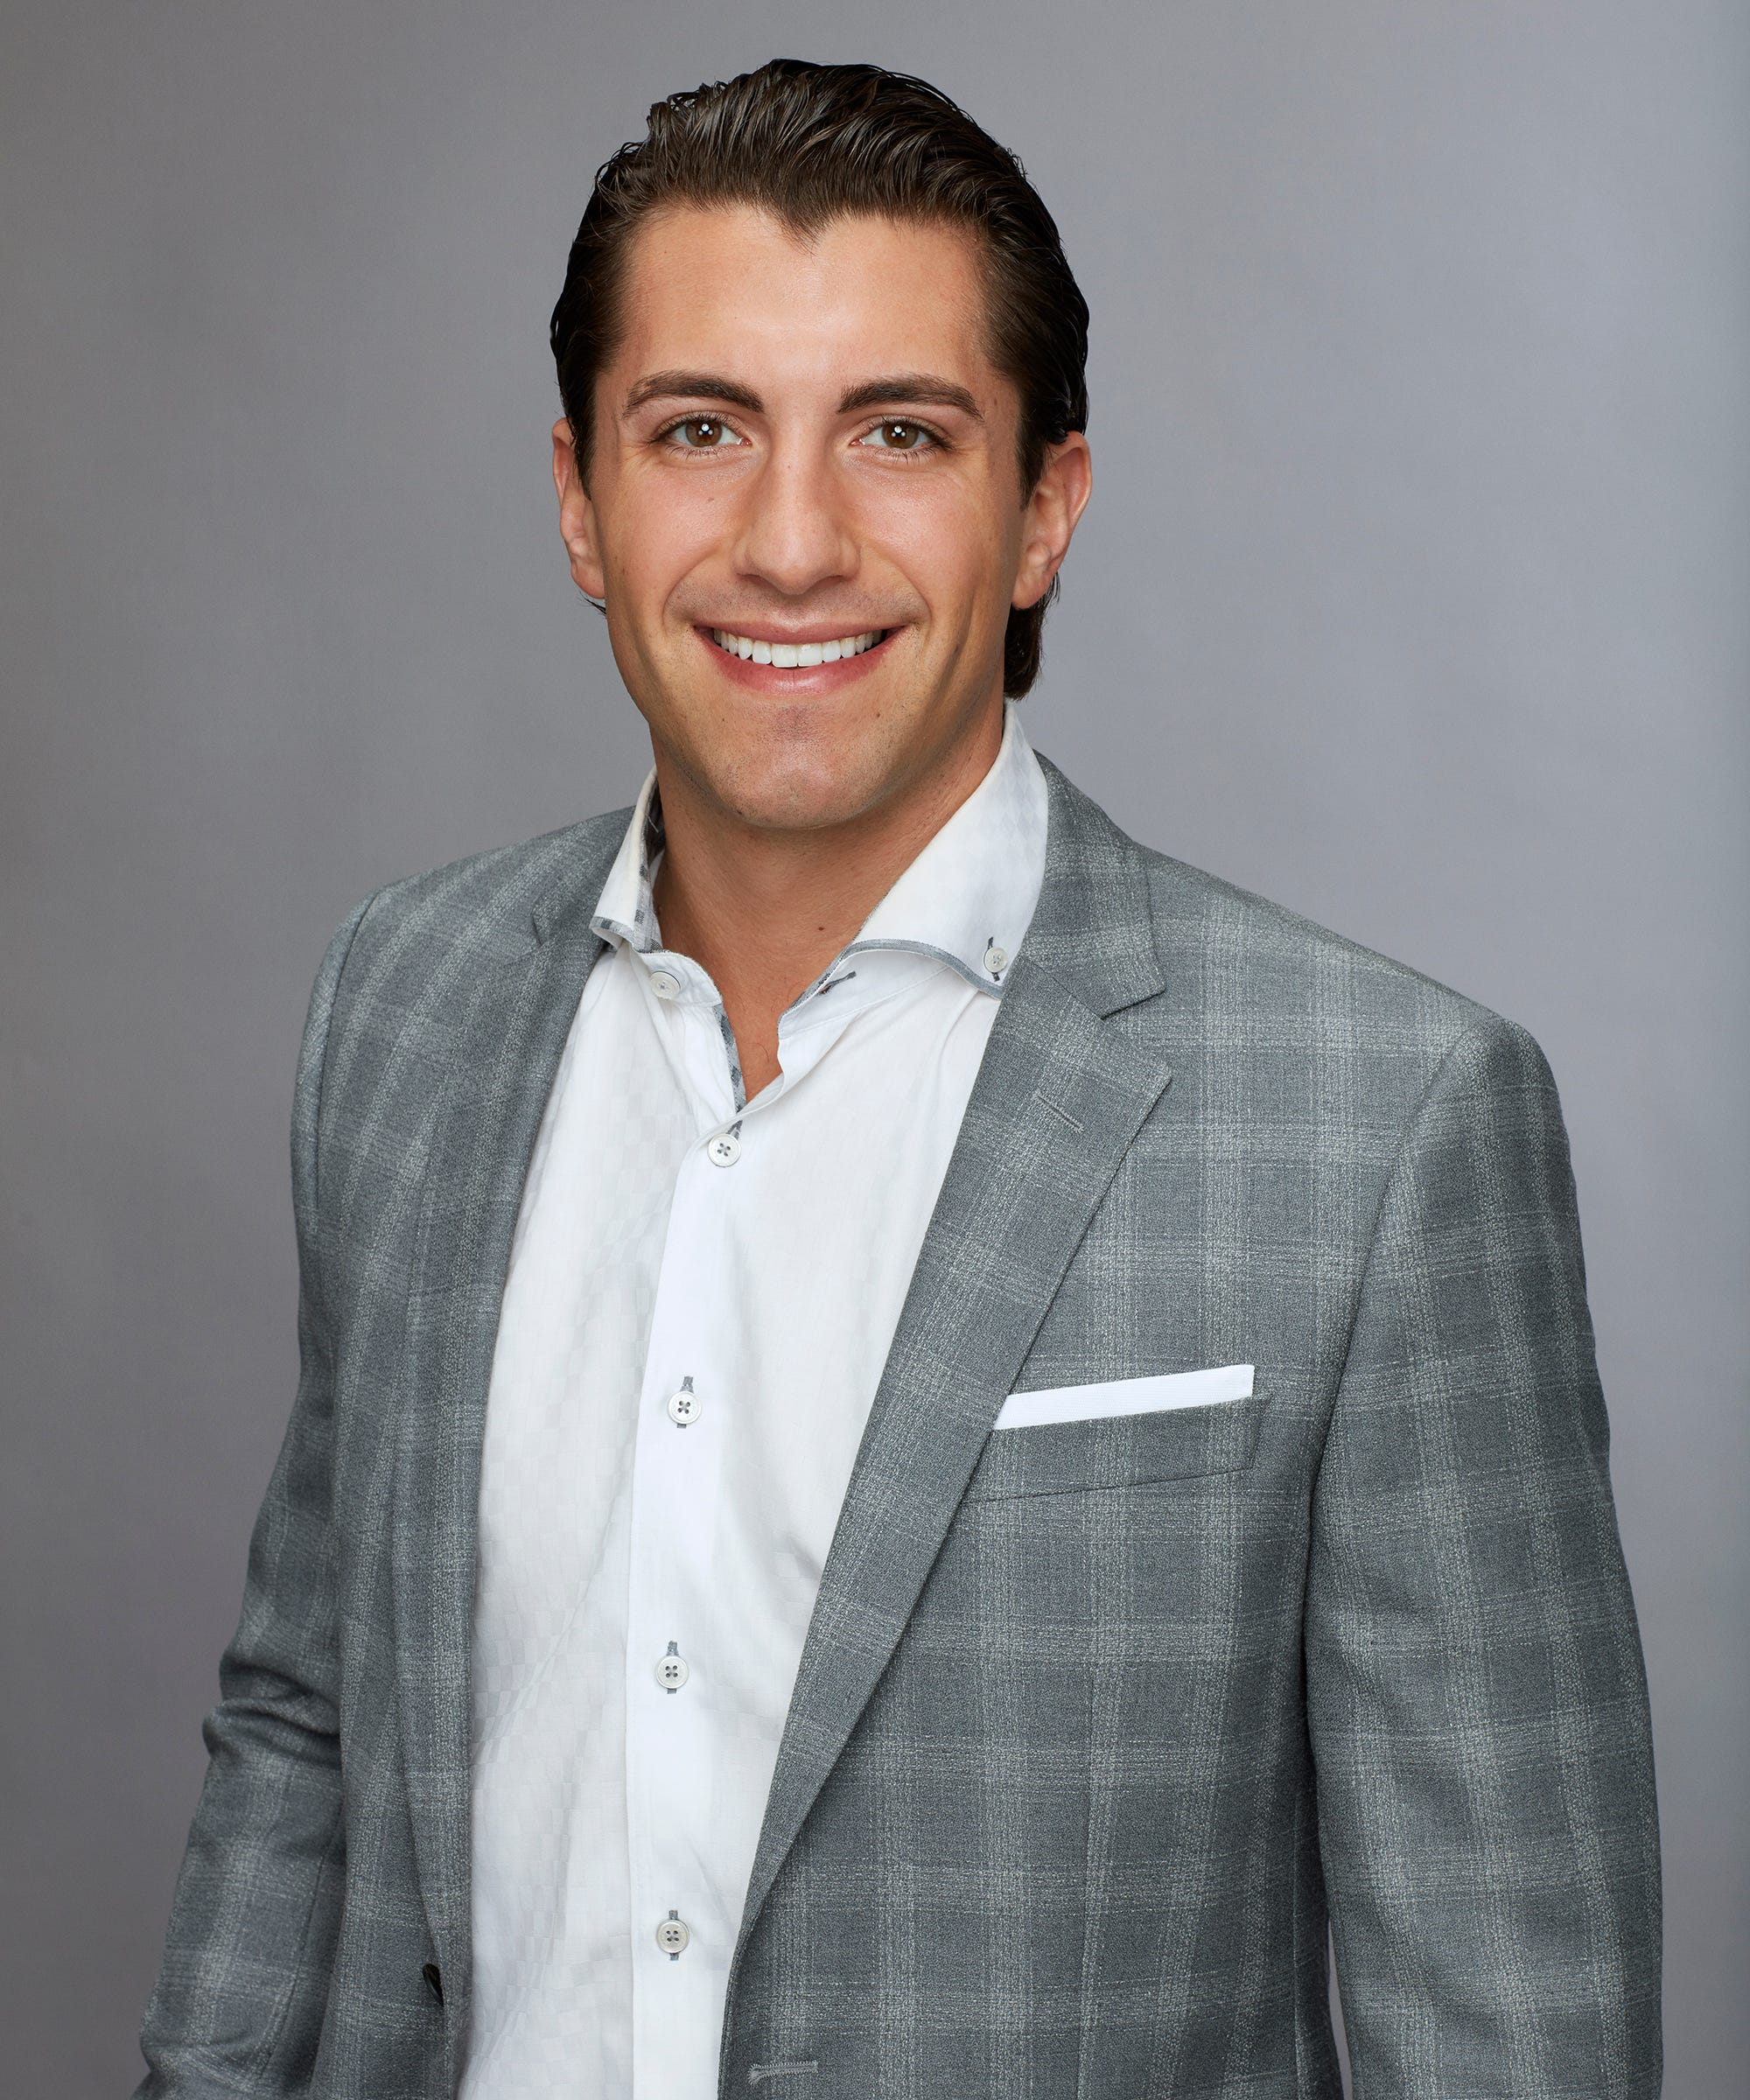 Jason Tartick The Bachelorette Interview